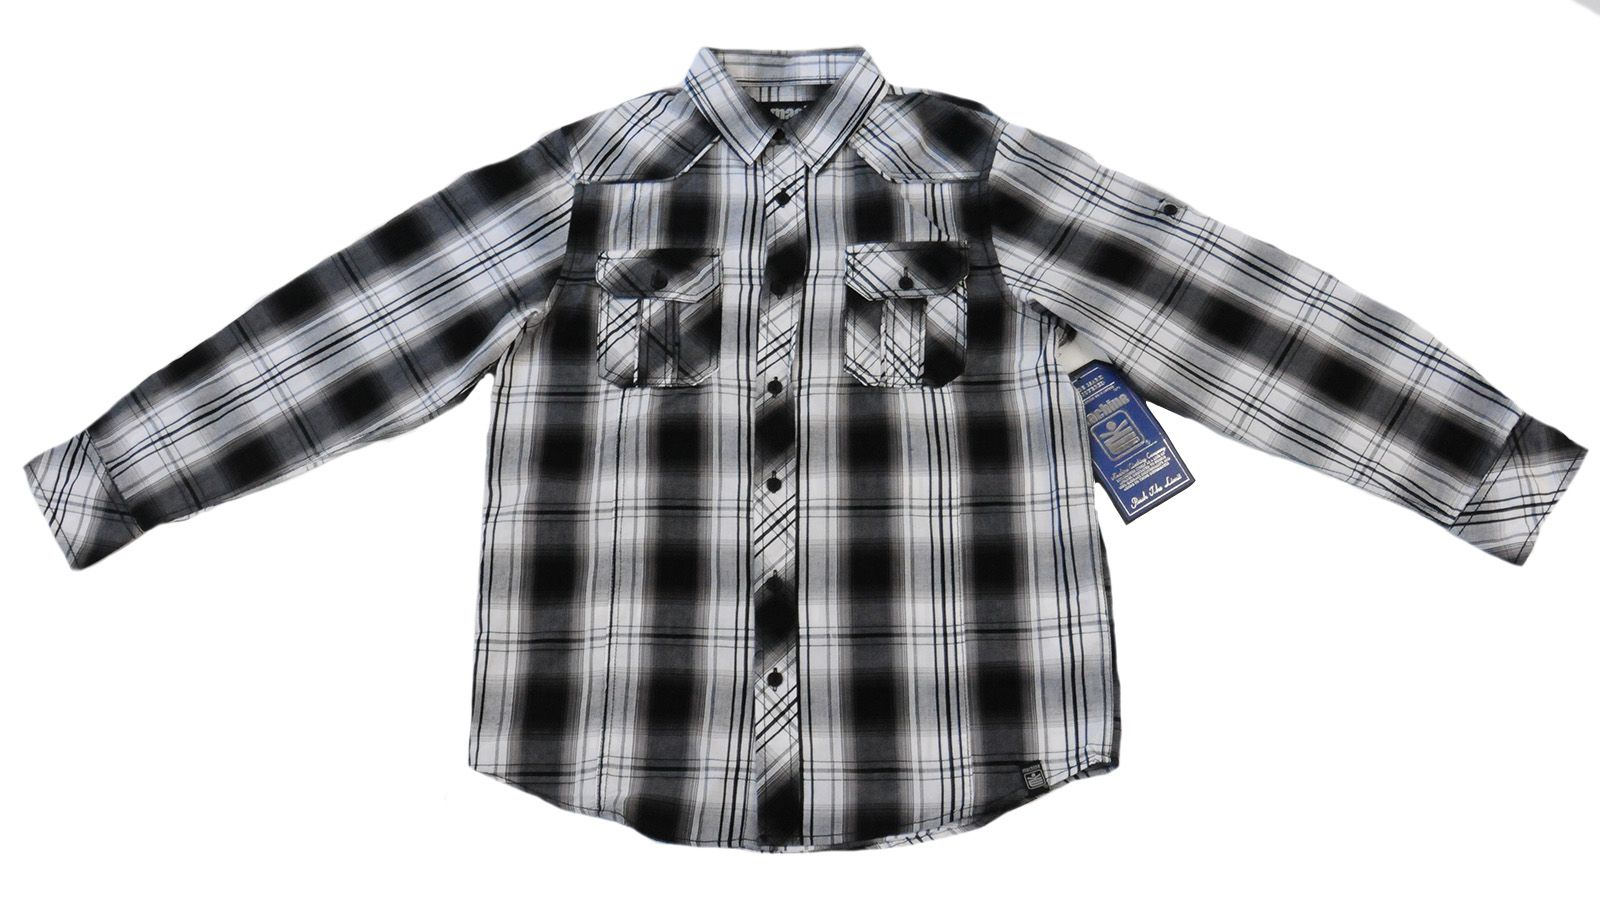 Брендовая рубашка для подростков Machine-вид спереди